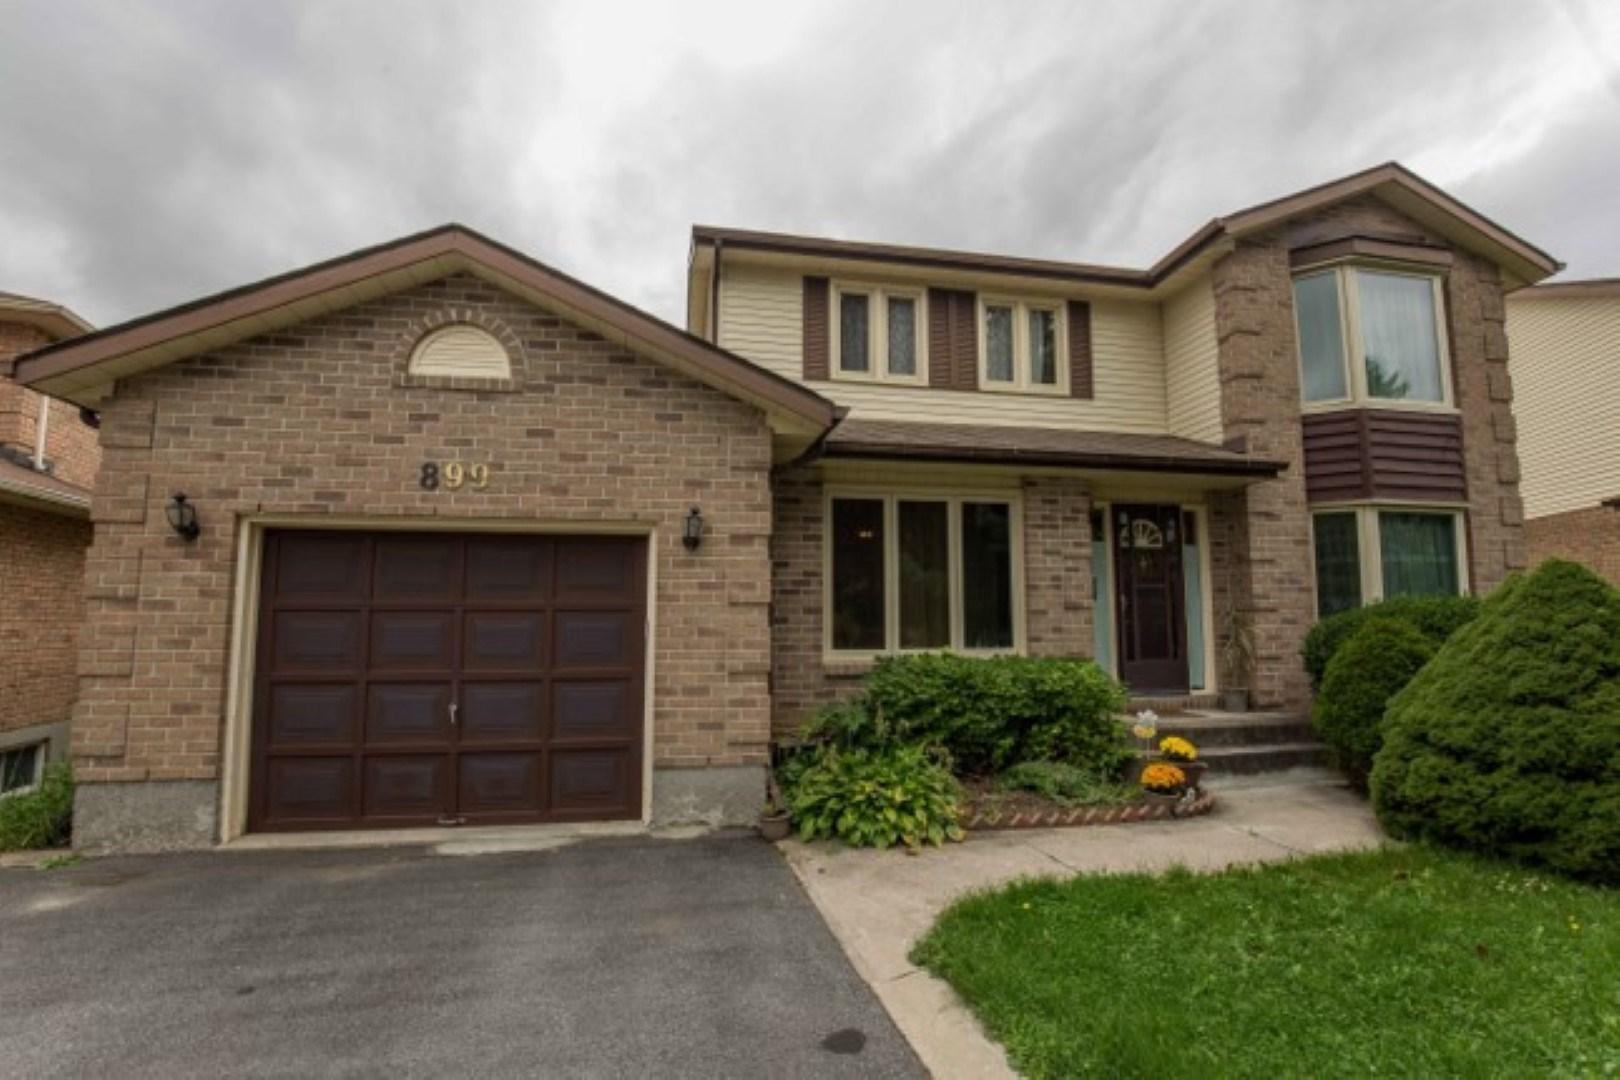 899 Plainview Place, Kingston Ontario, Canada